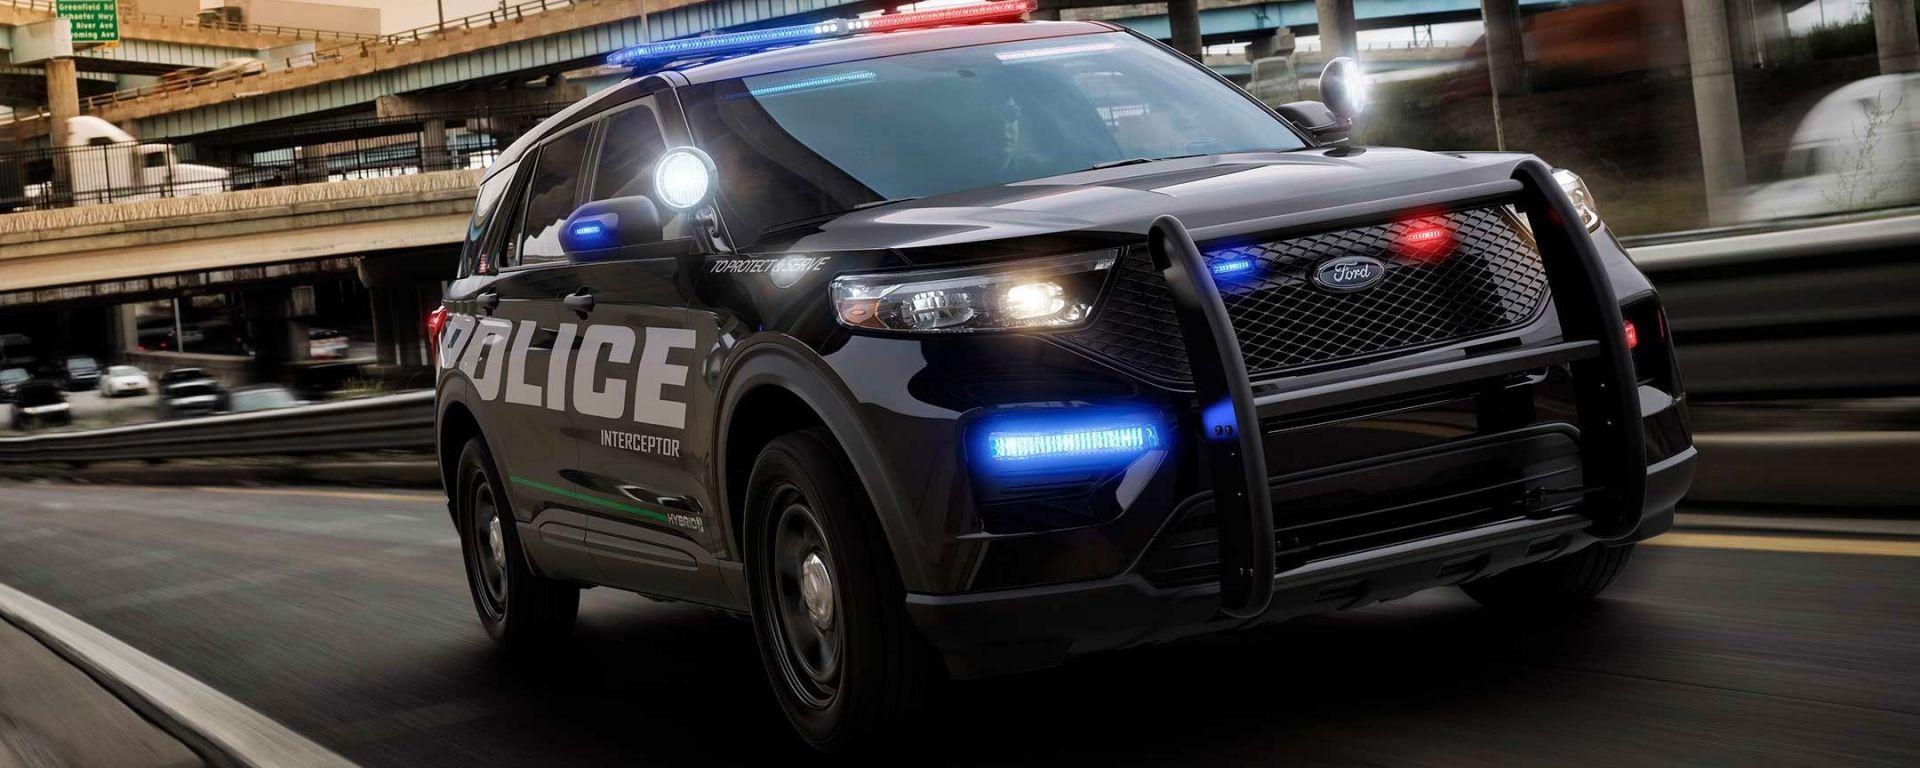 Ford Interceptor Police 2020